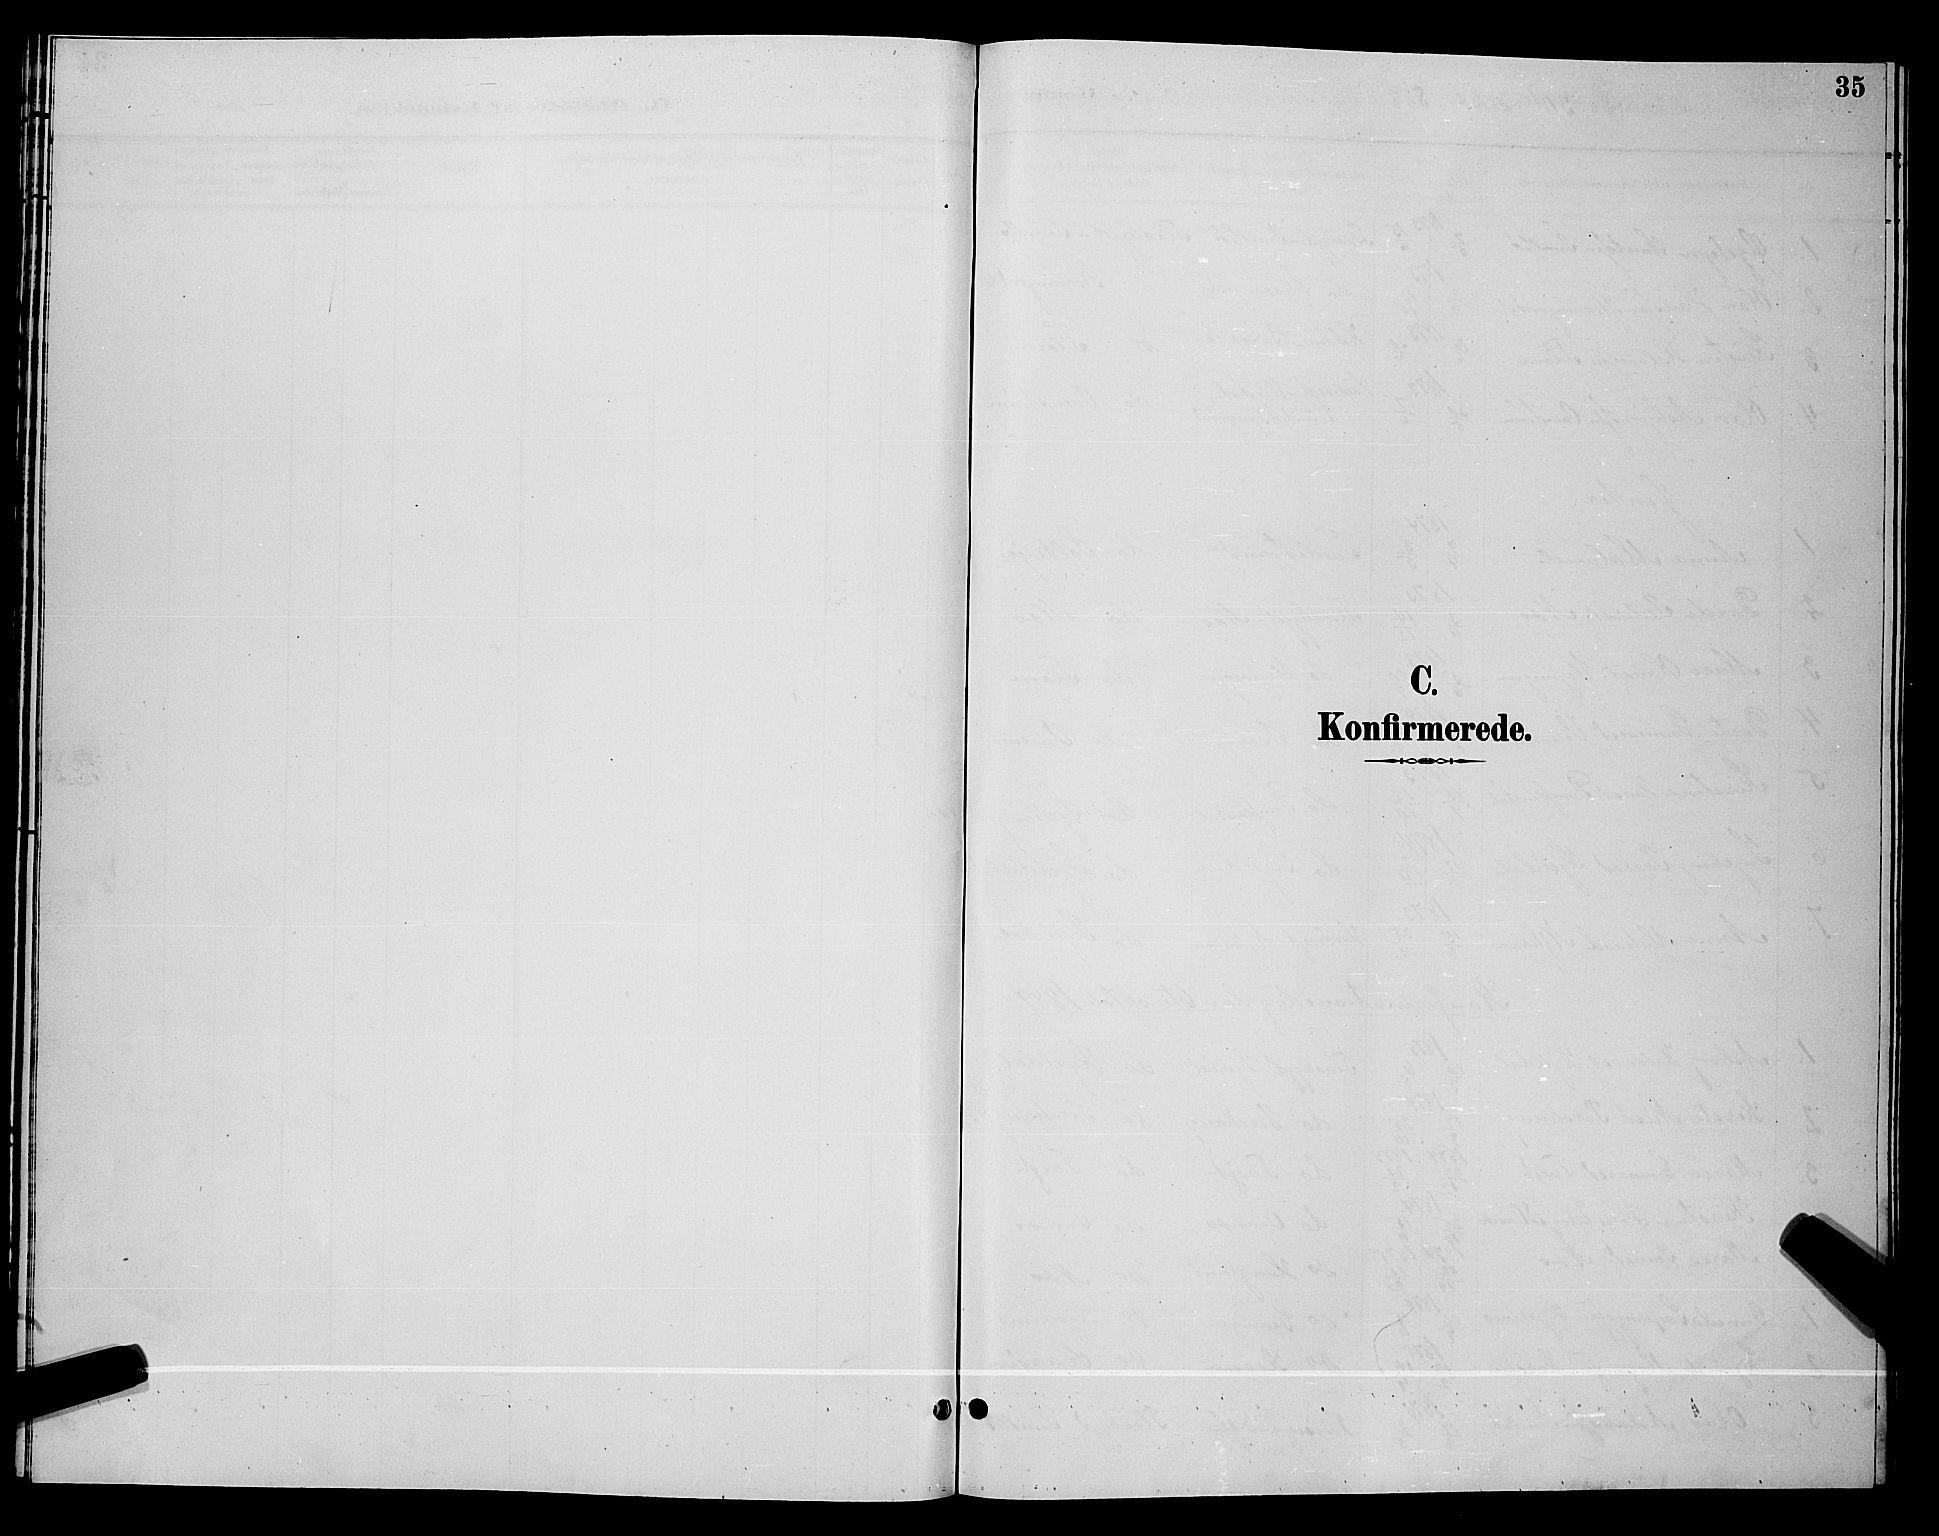 SAKO, Lunde kirkebøker, G/Gb/L0002: Klokkerbok nr. II 2, 1888-1895, s. 35